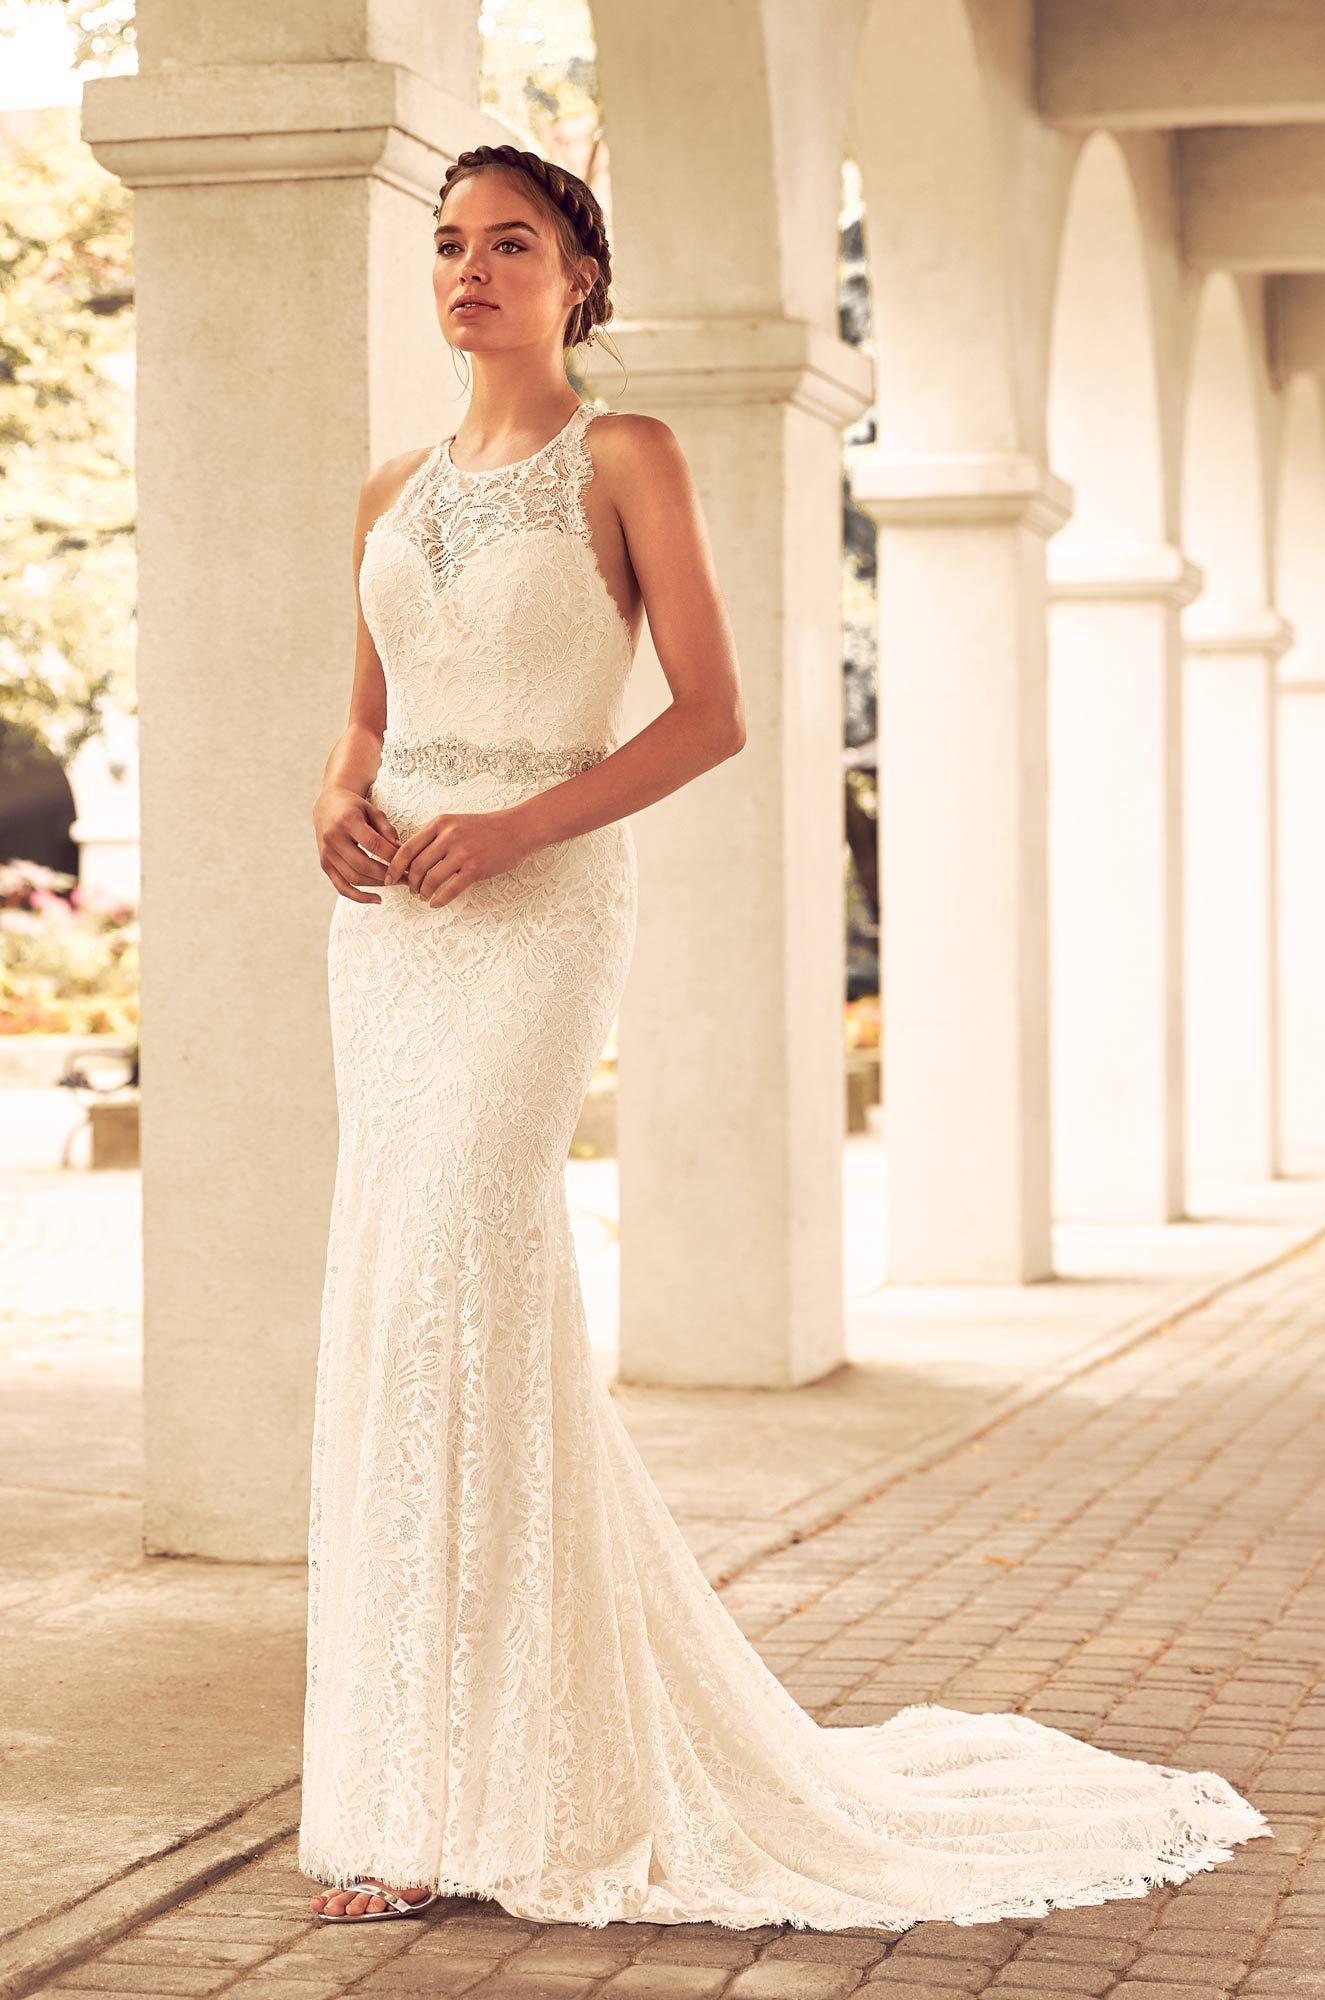 Lace racerback wedding dress style bateau neckline paloma